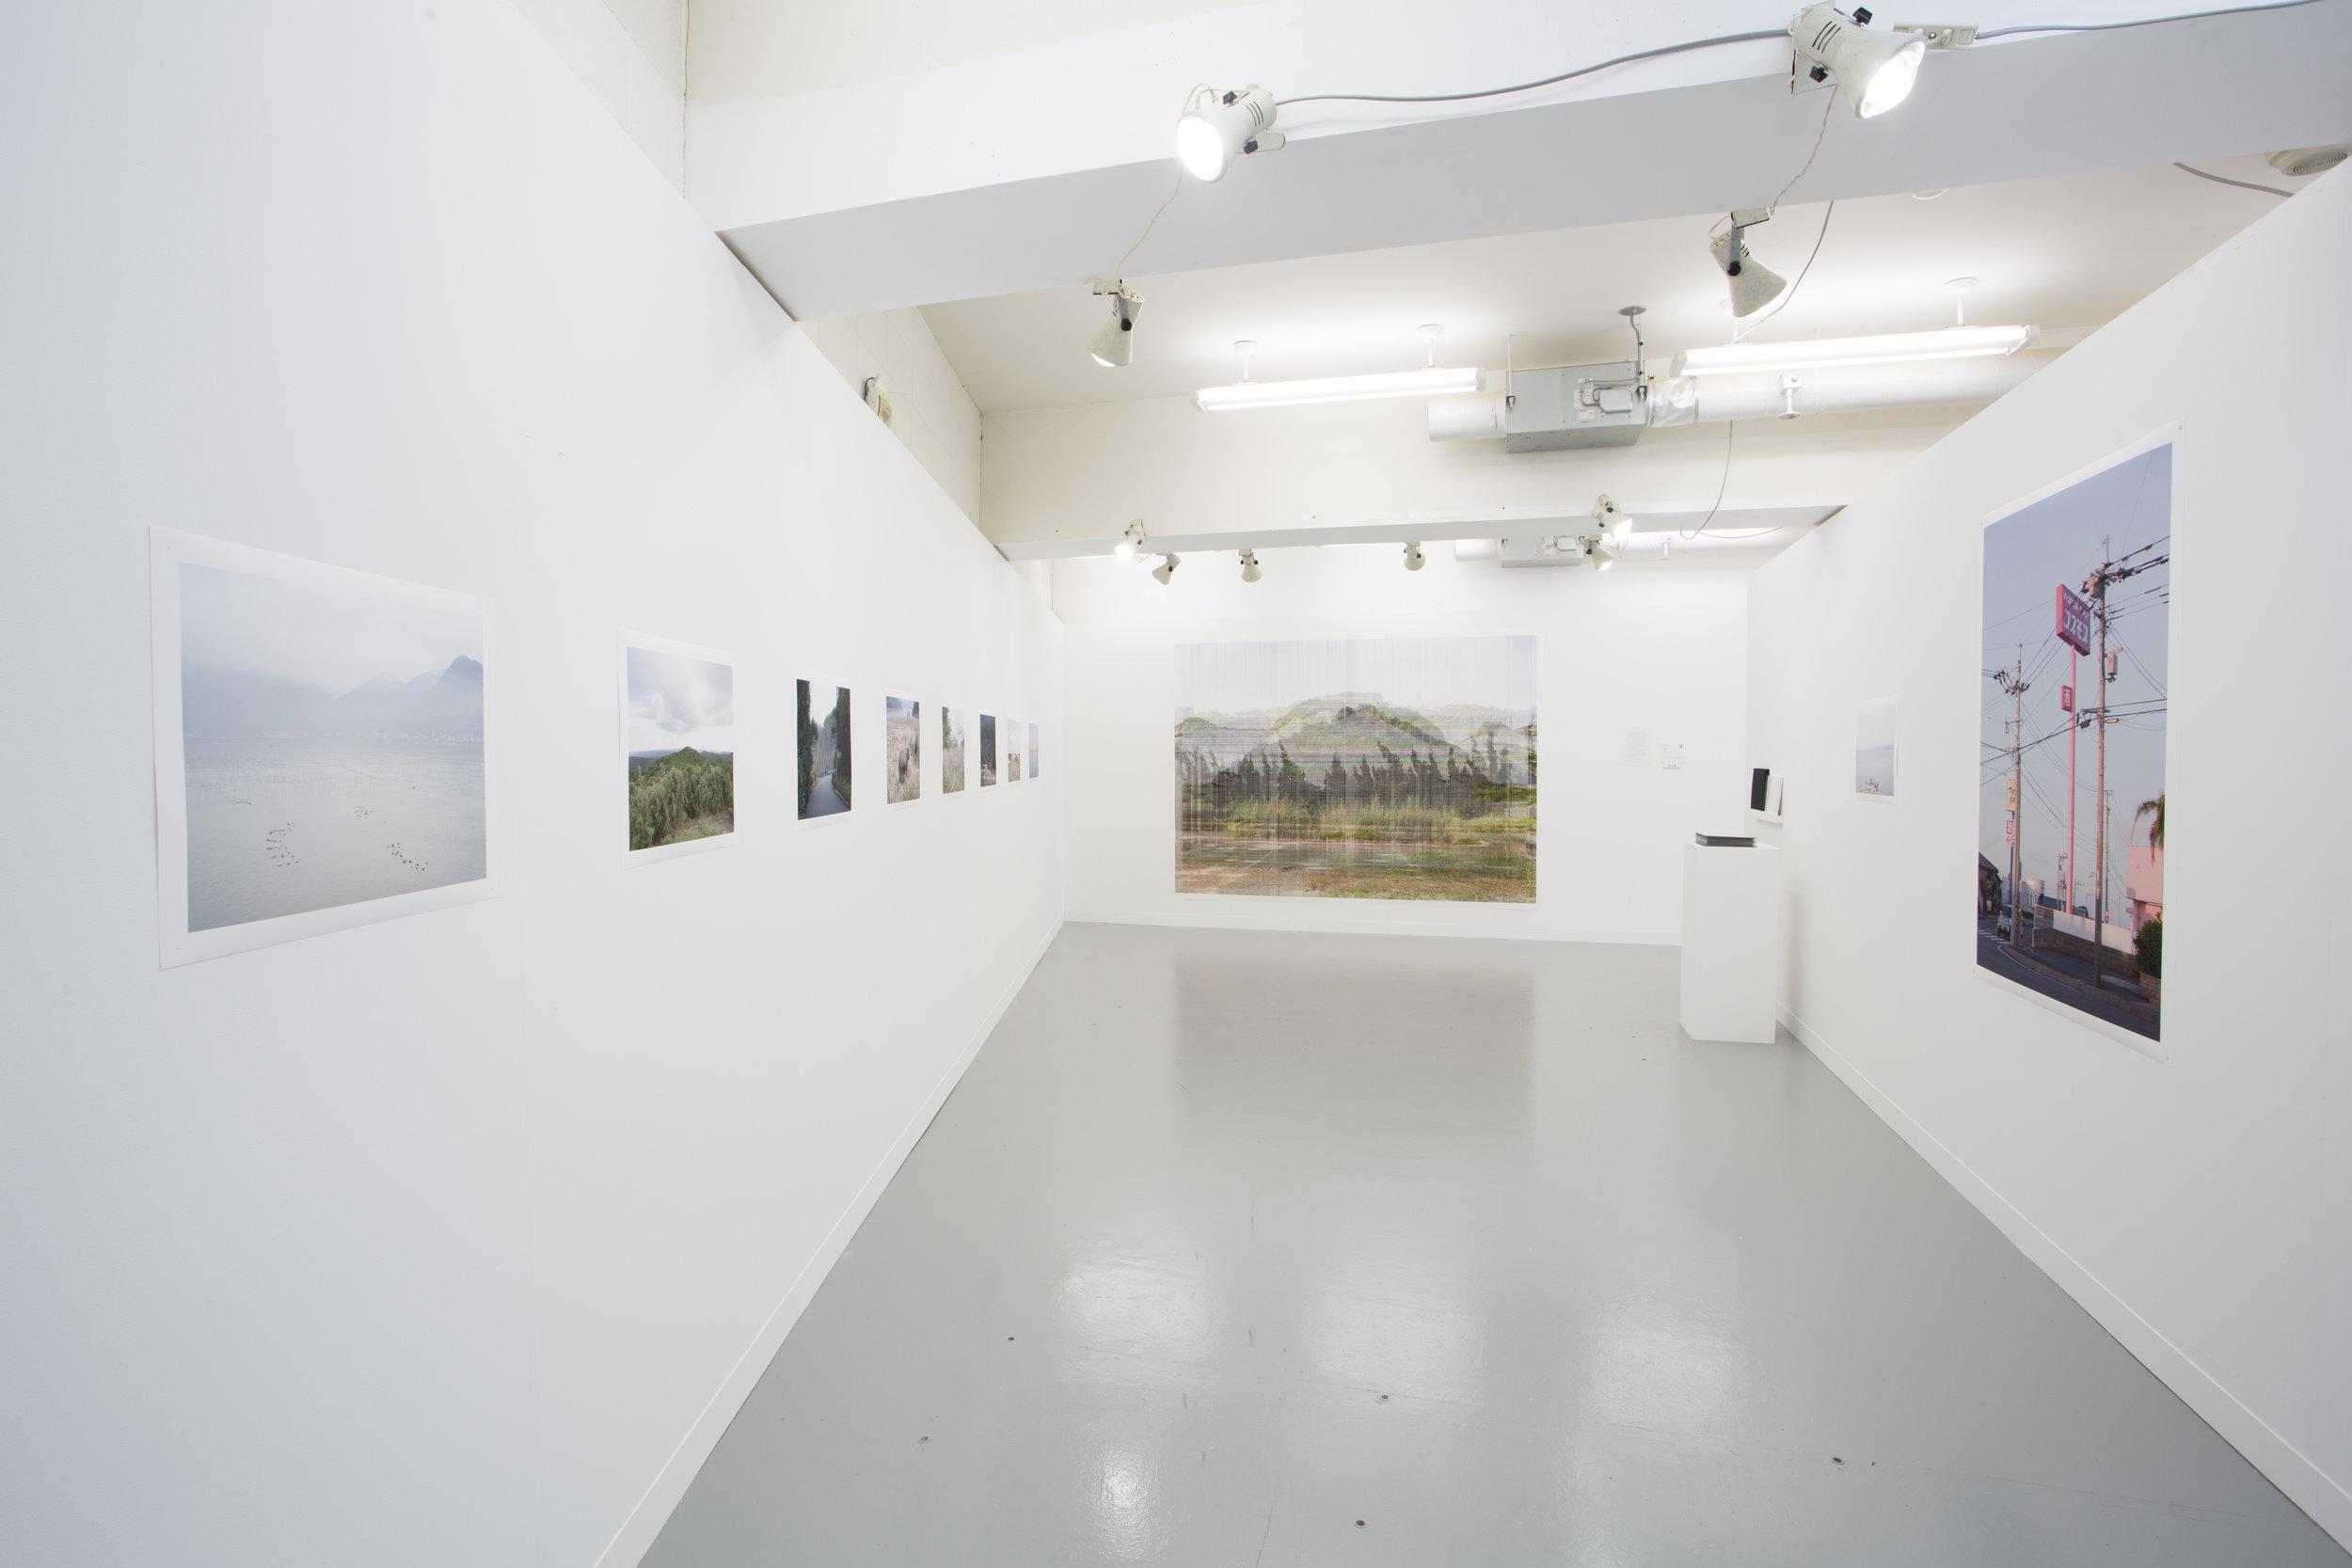 Utopia  Kyoto University of Art and Design (Graduation Show), 2018